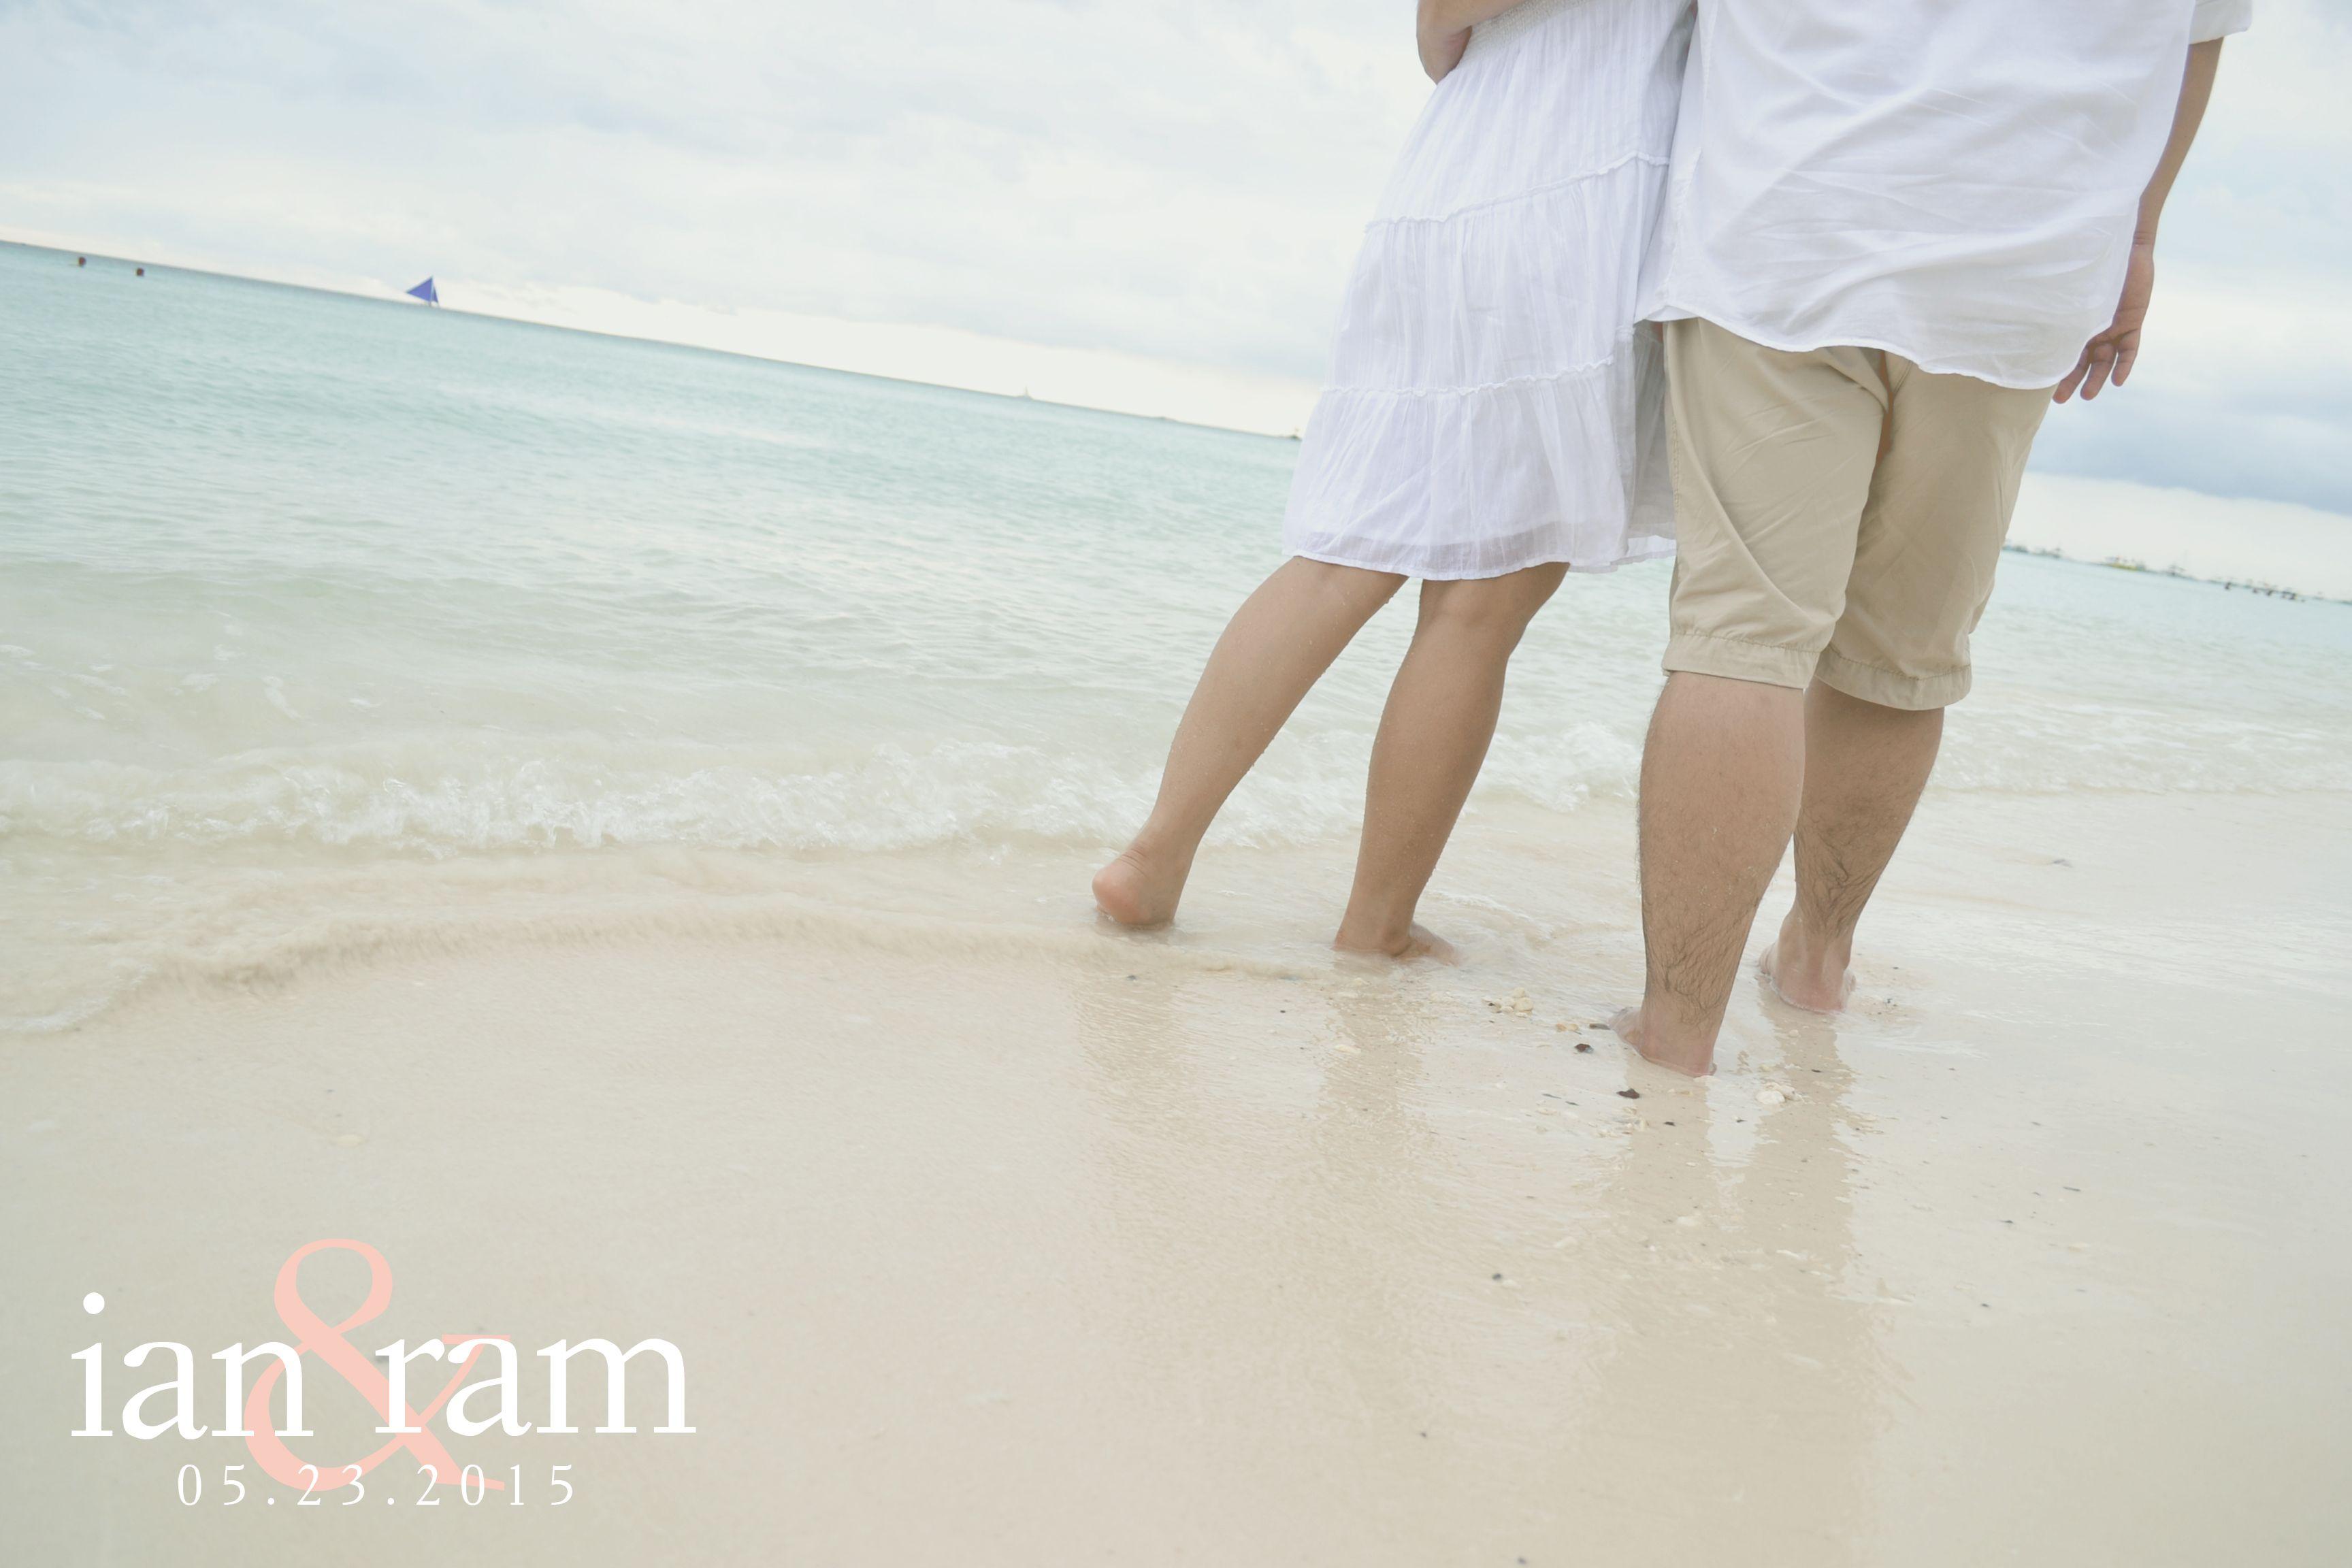 ian and ram prenup photos  photo by yan-yan gervero